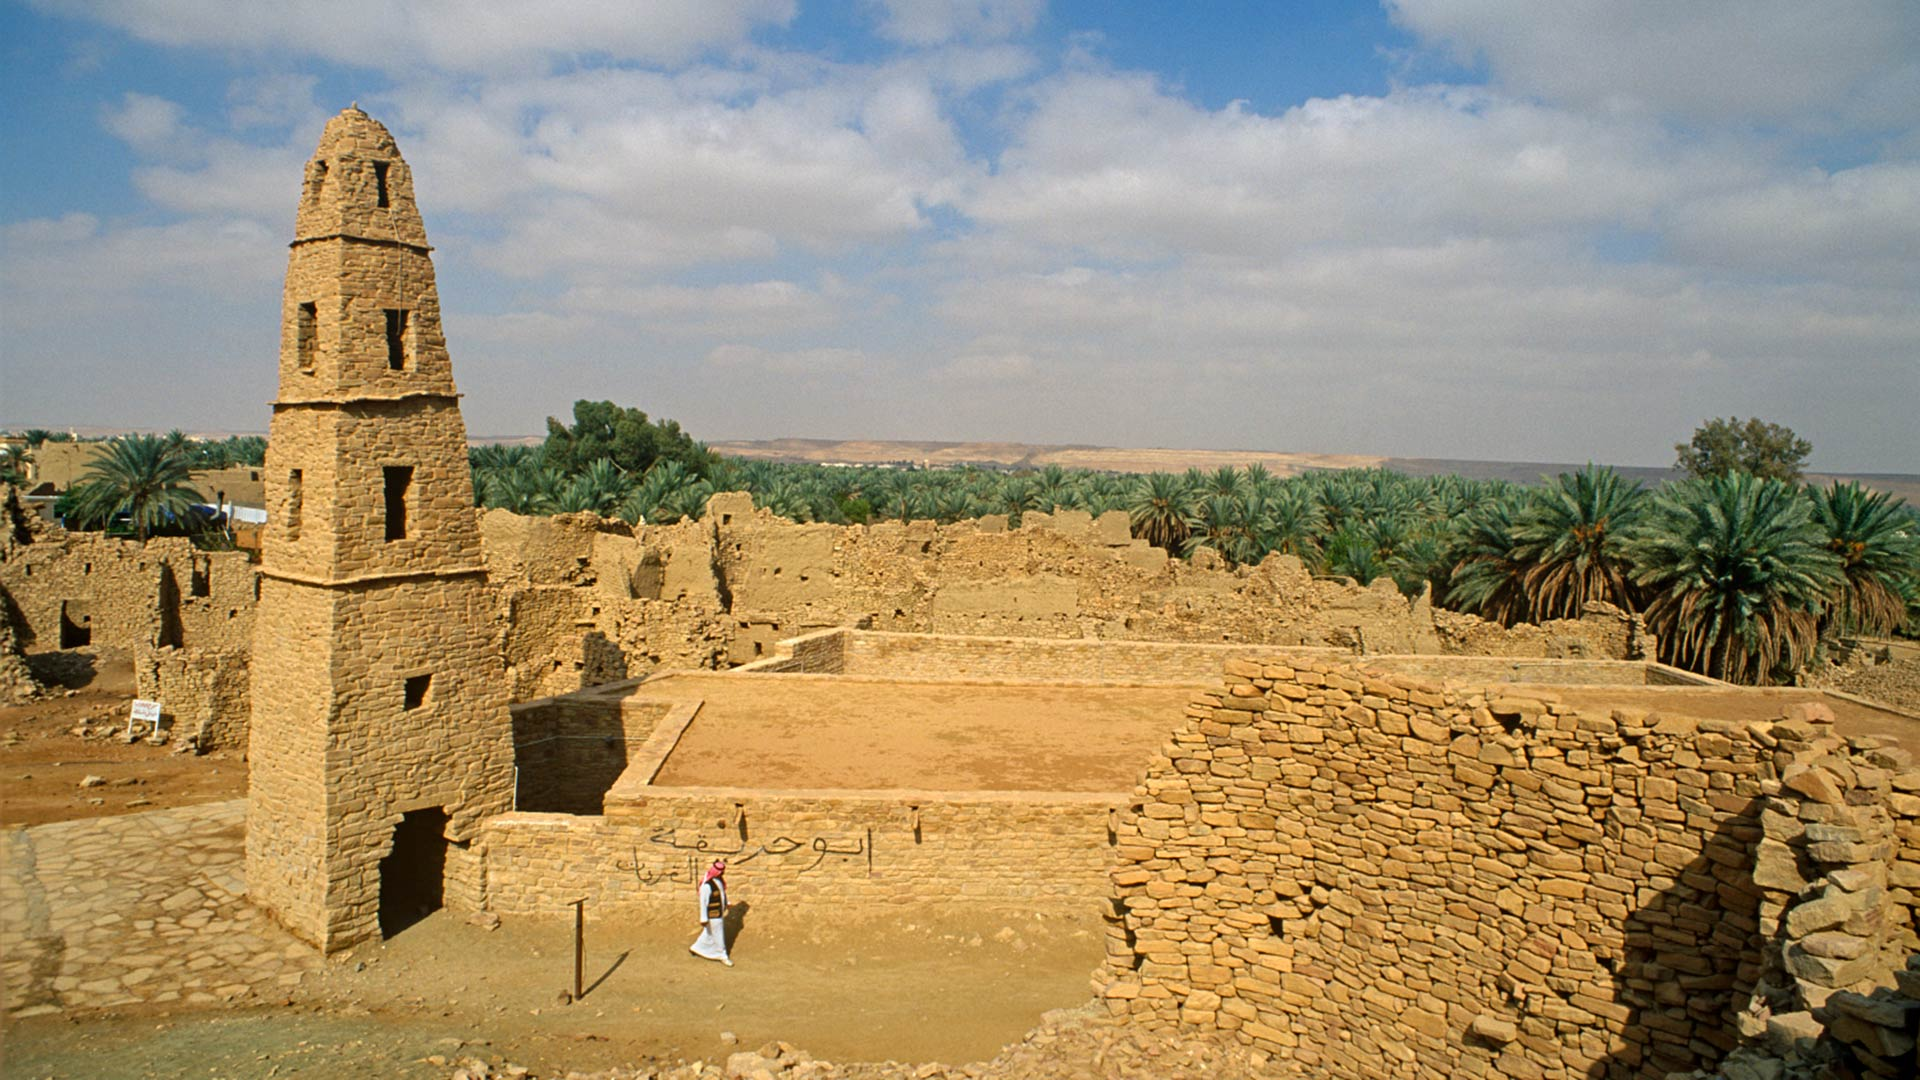 Ruins of Mosque of Omar in Jouf Saudi, Arabia